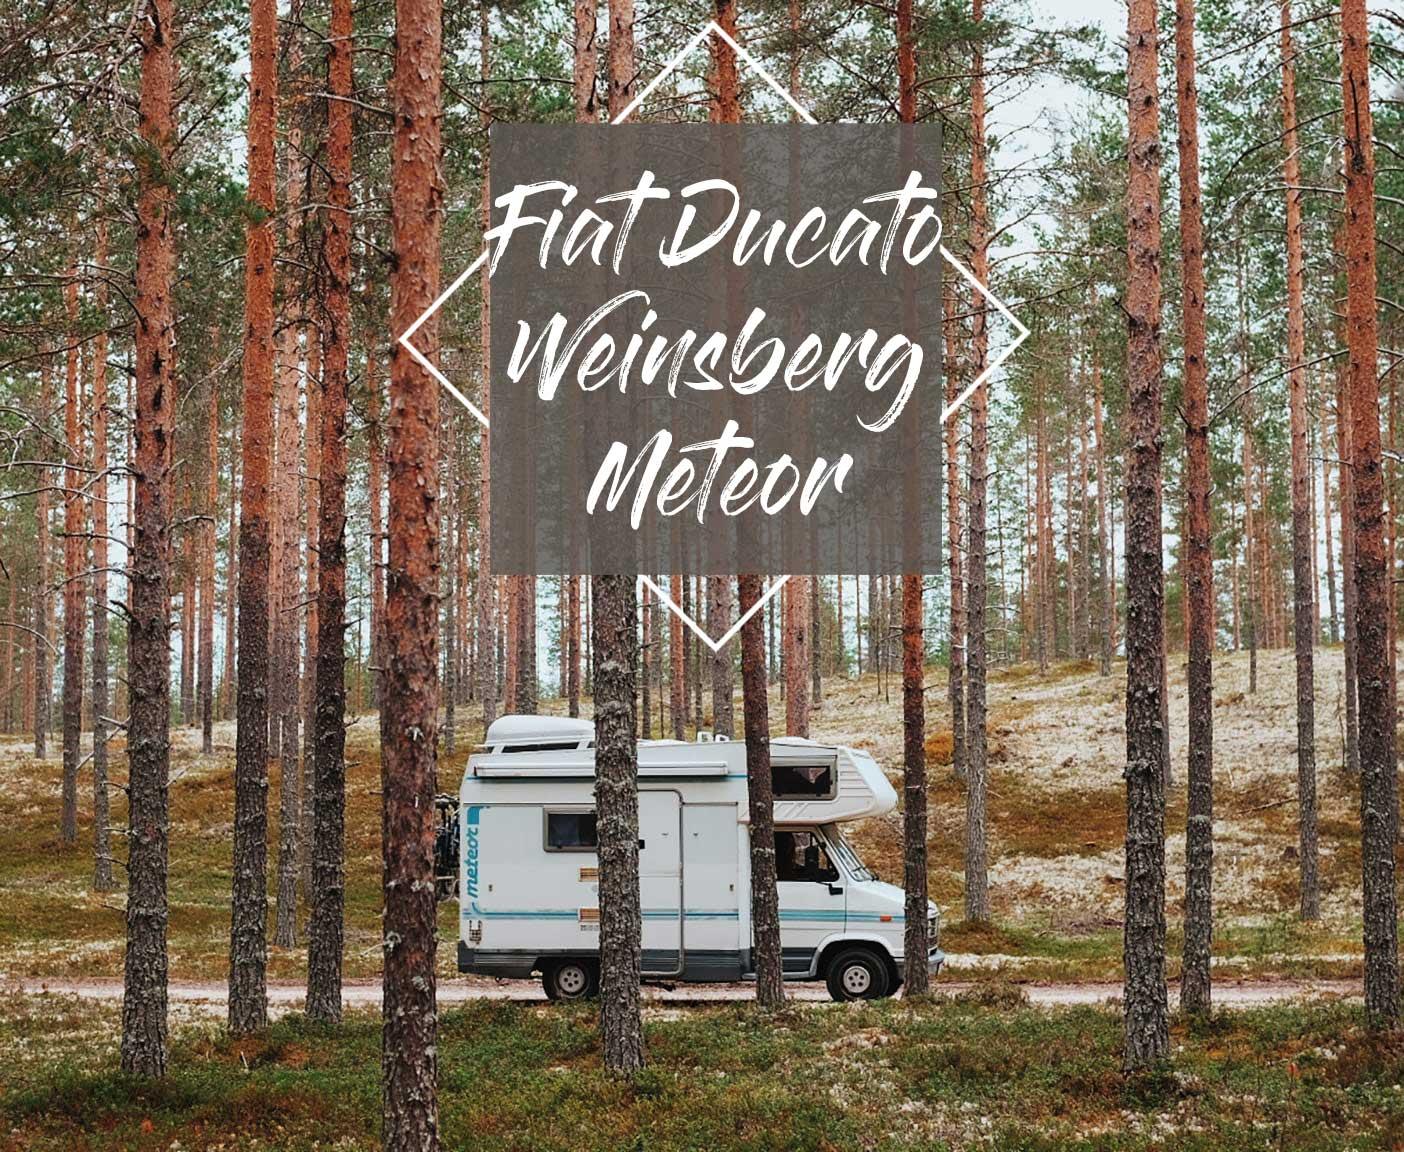 Fiat-Ducato-Weinsberg-Meteor-kaufen-reisen-vanlife-vanconversion